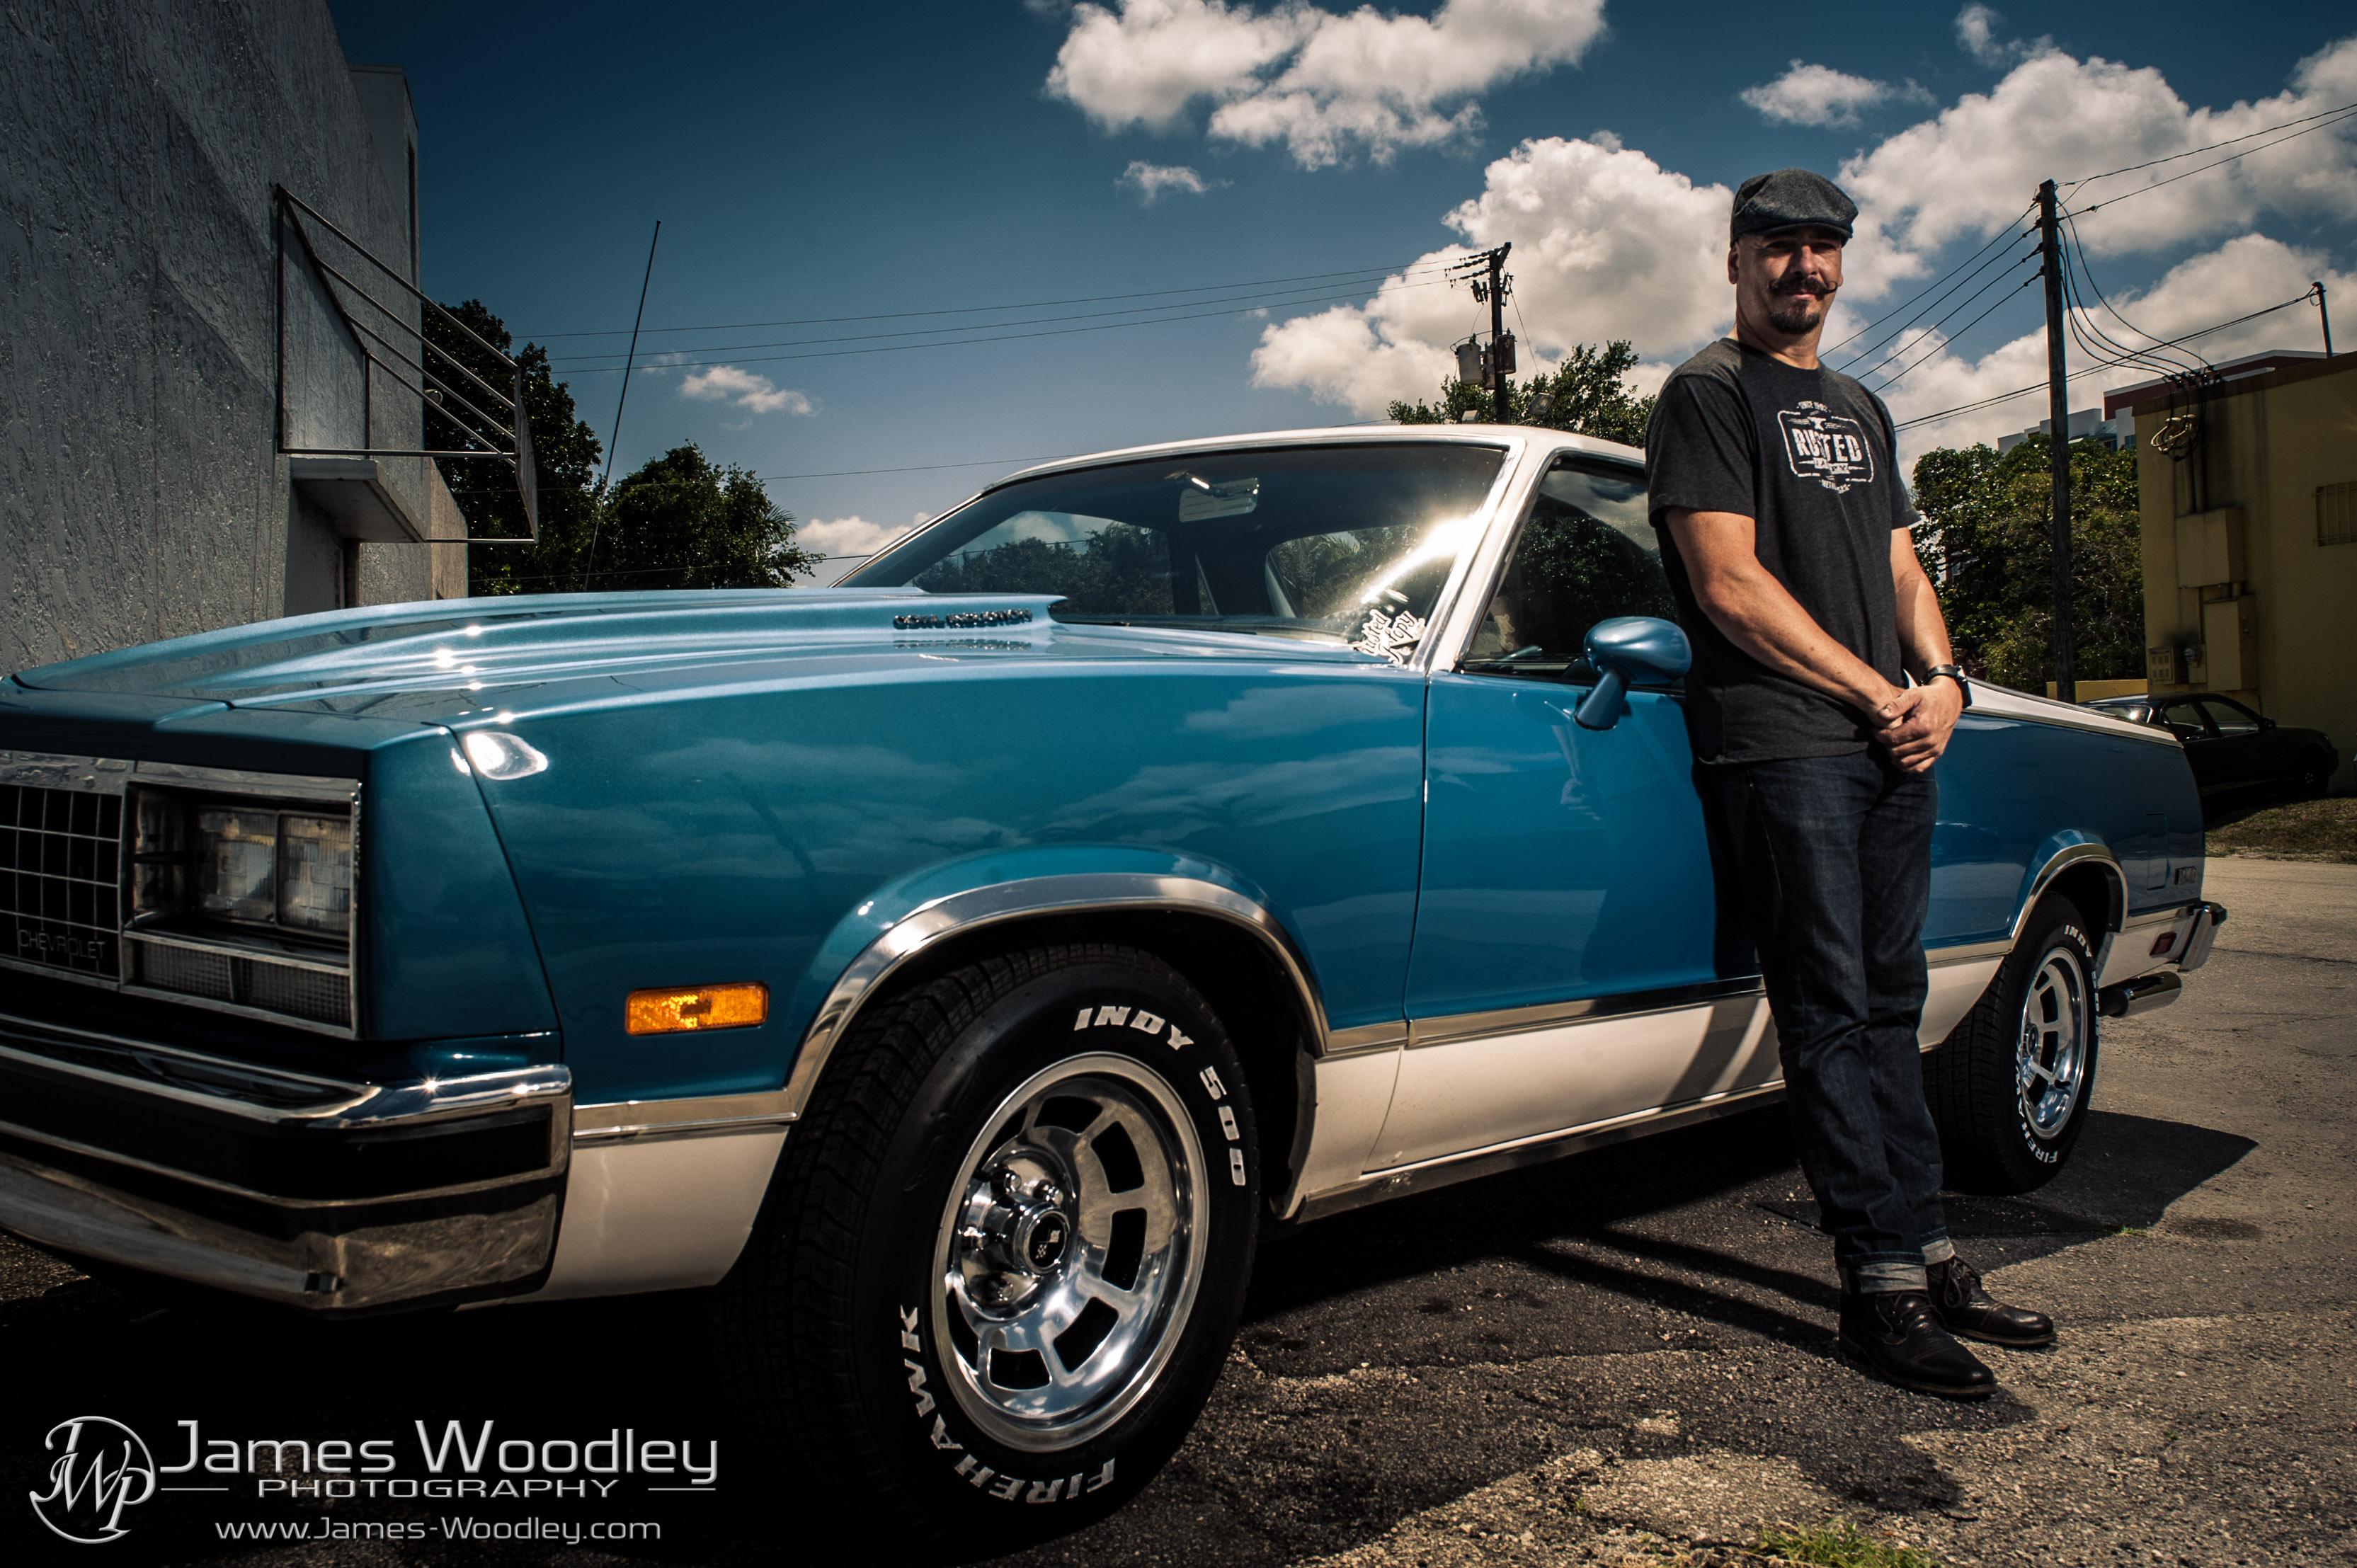 ©James Woodley Photography - www.james-woodley.com